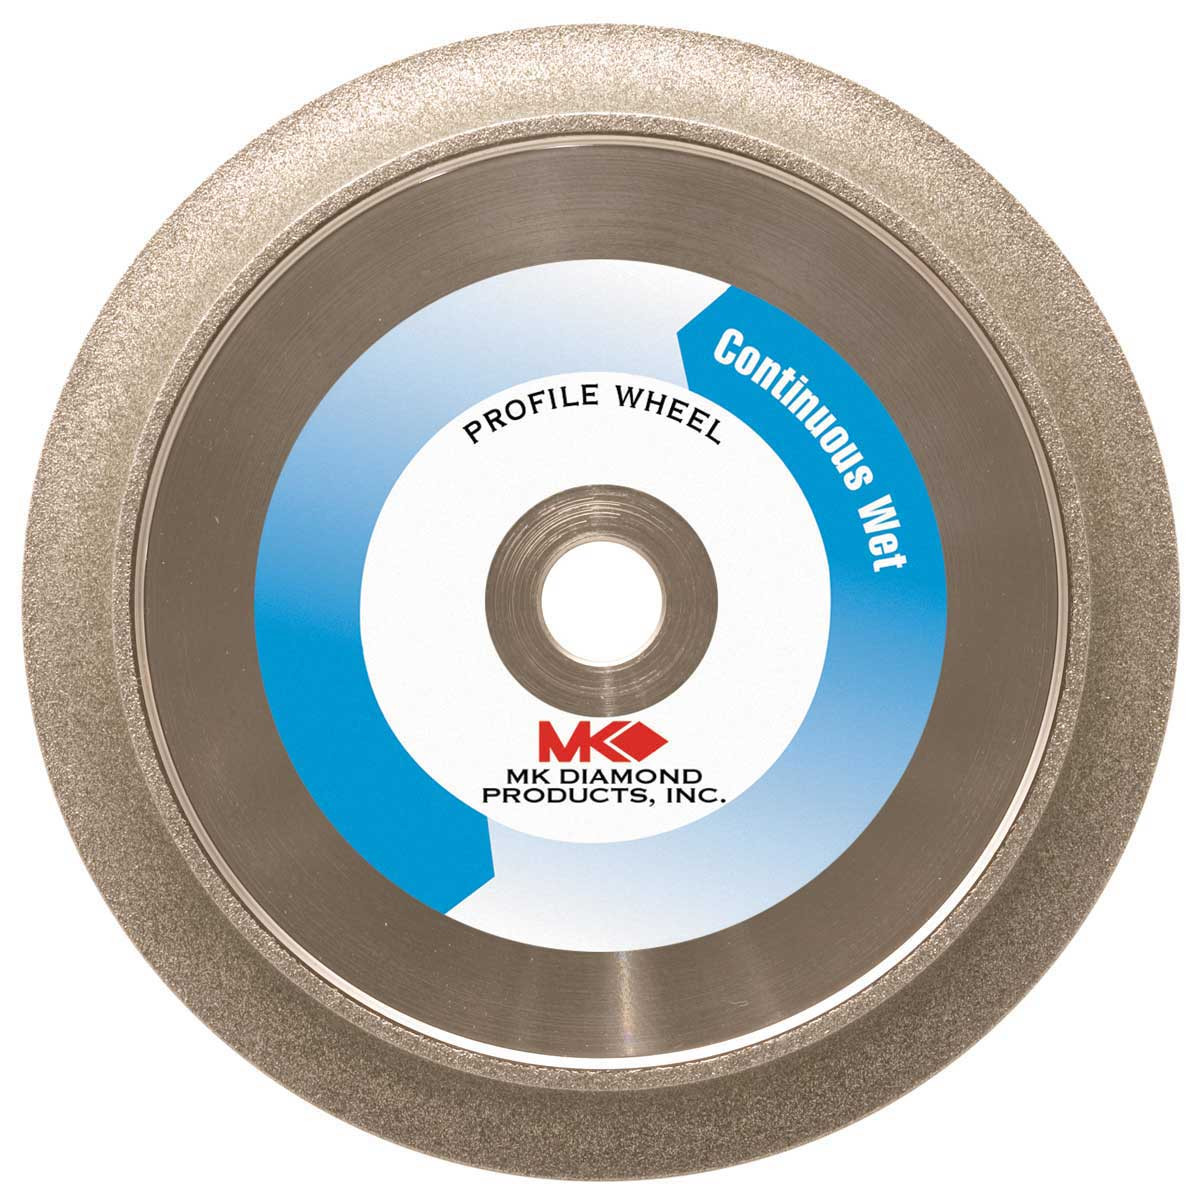 MK-275 6 inch Marble Diamond Profile Wheel